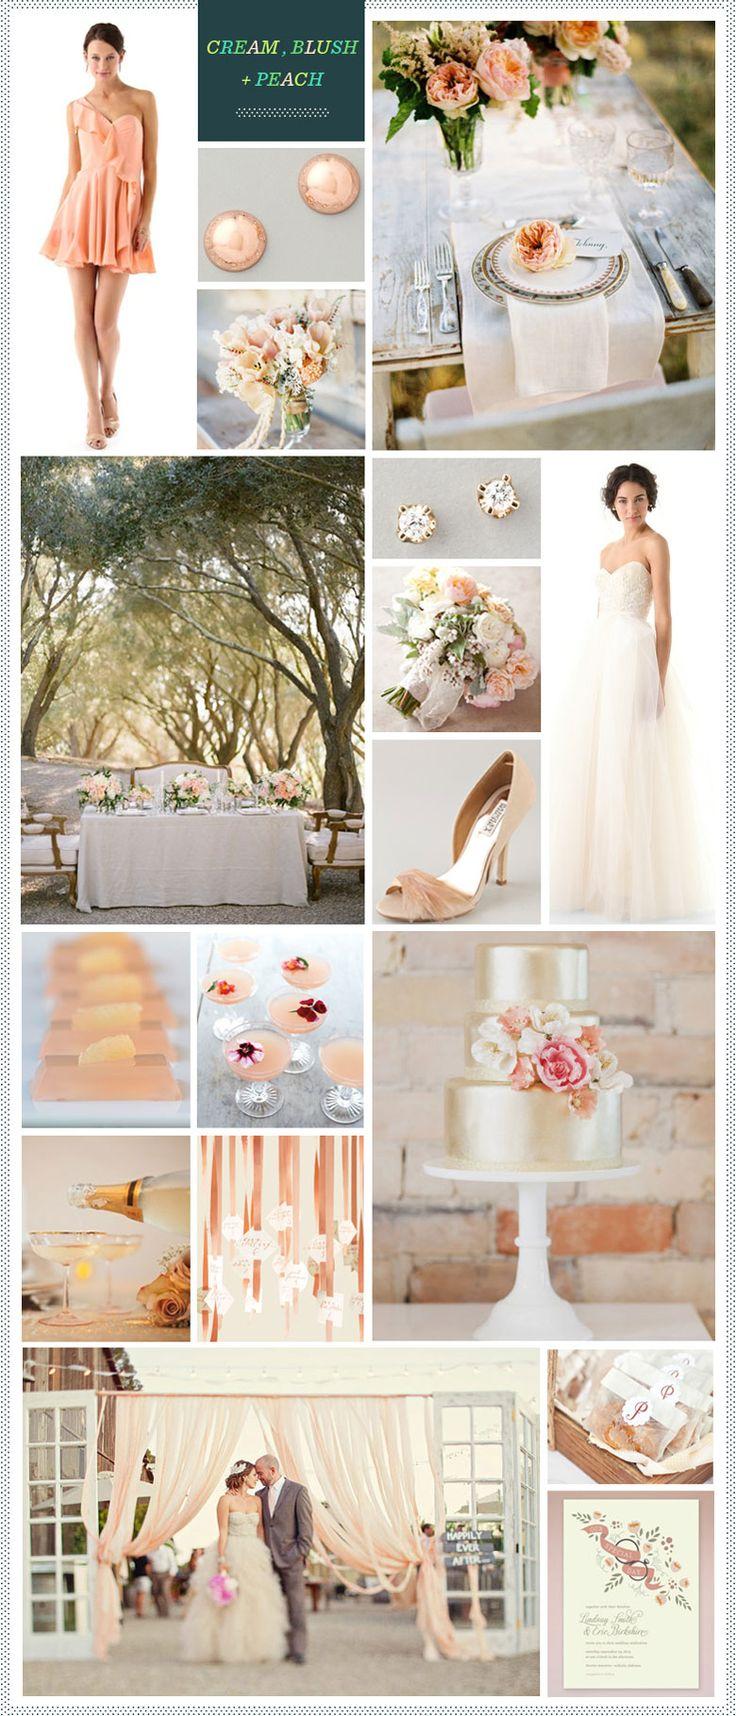 Cream, Blush + Peach wedding inspiration